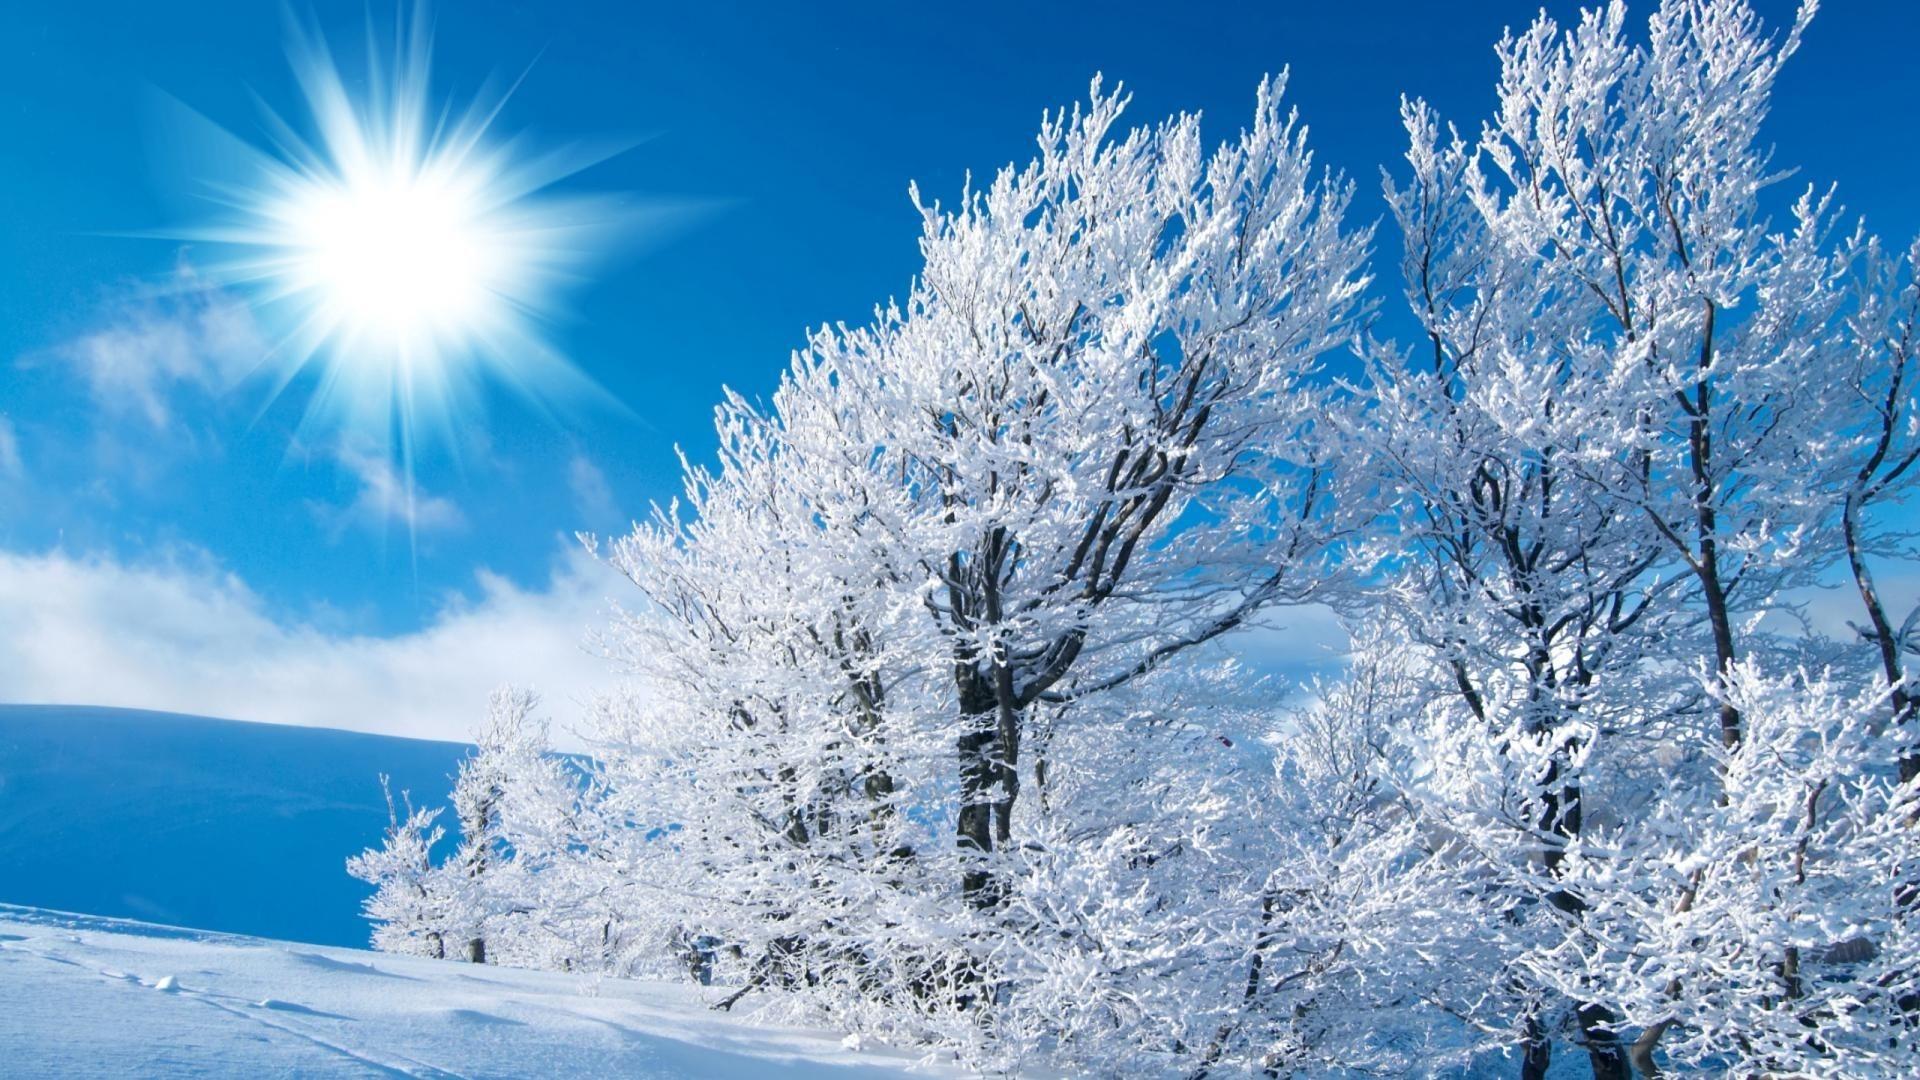 Wallpapers Backgrounds – Winter Wallpaper 1080P WideScreen  background